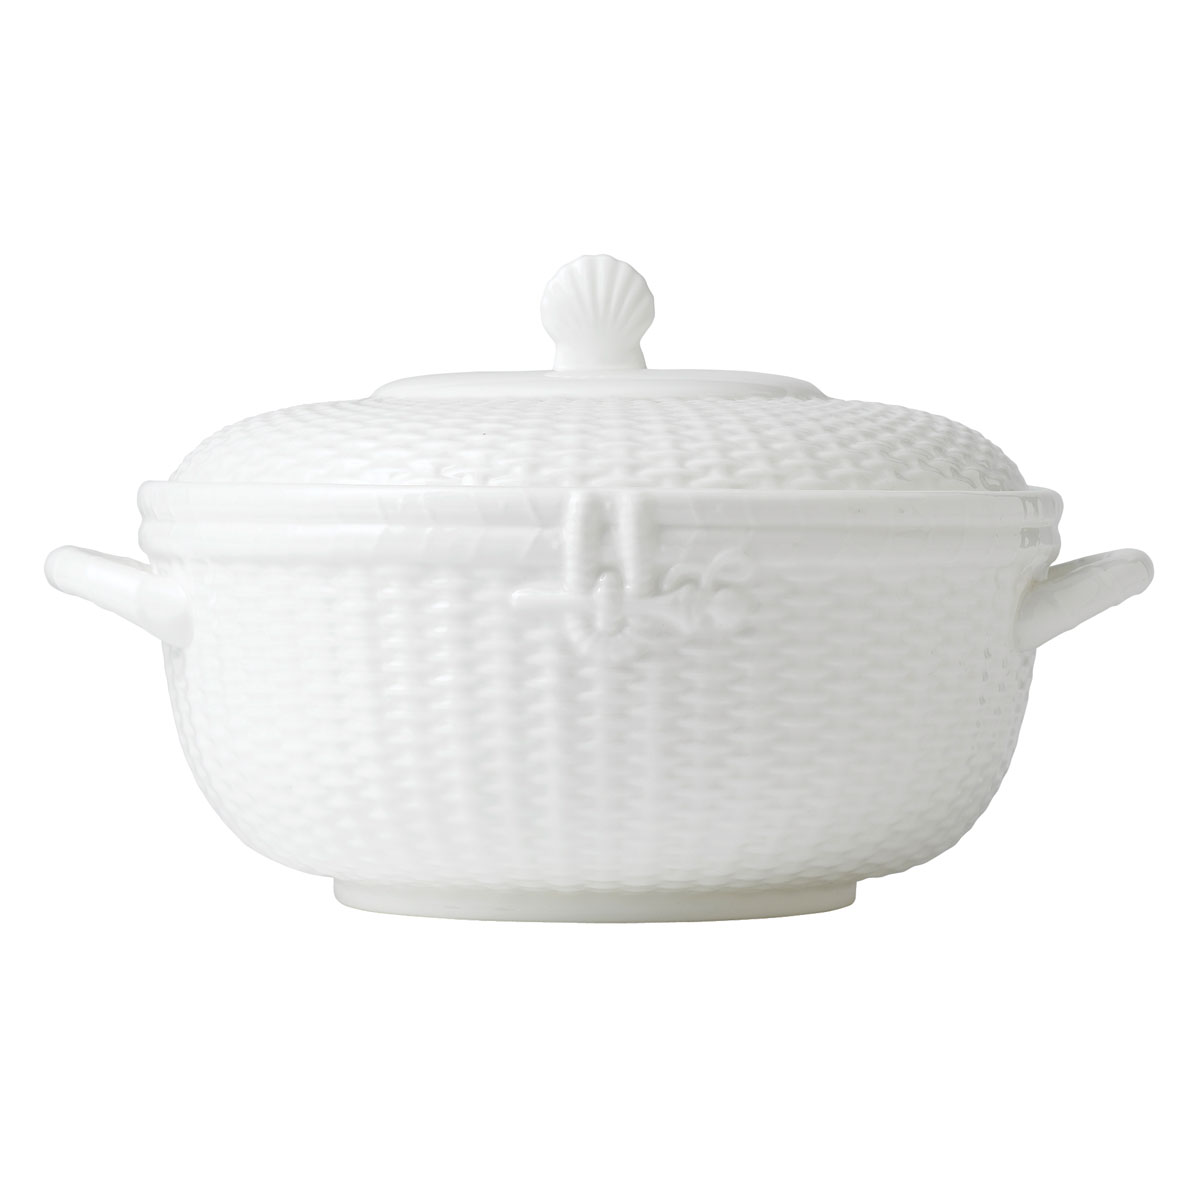 Wedgwood Nantucket Basket Covered Vegetable